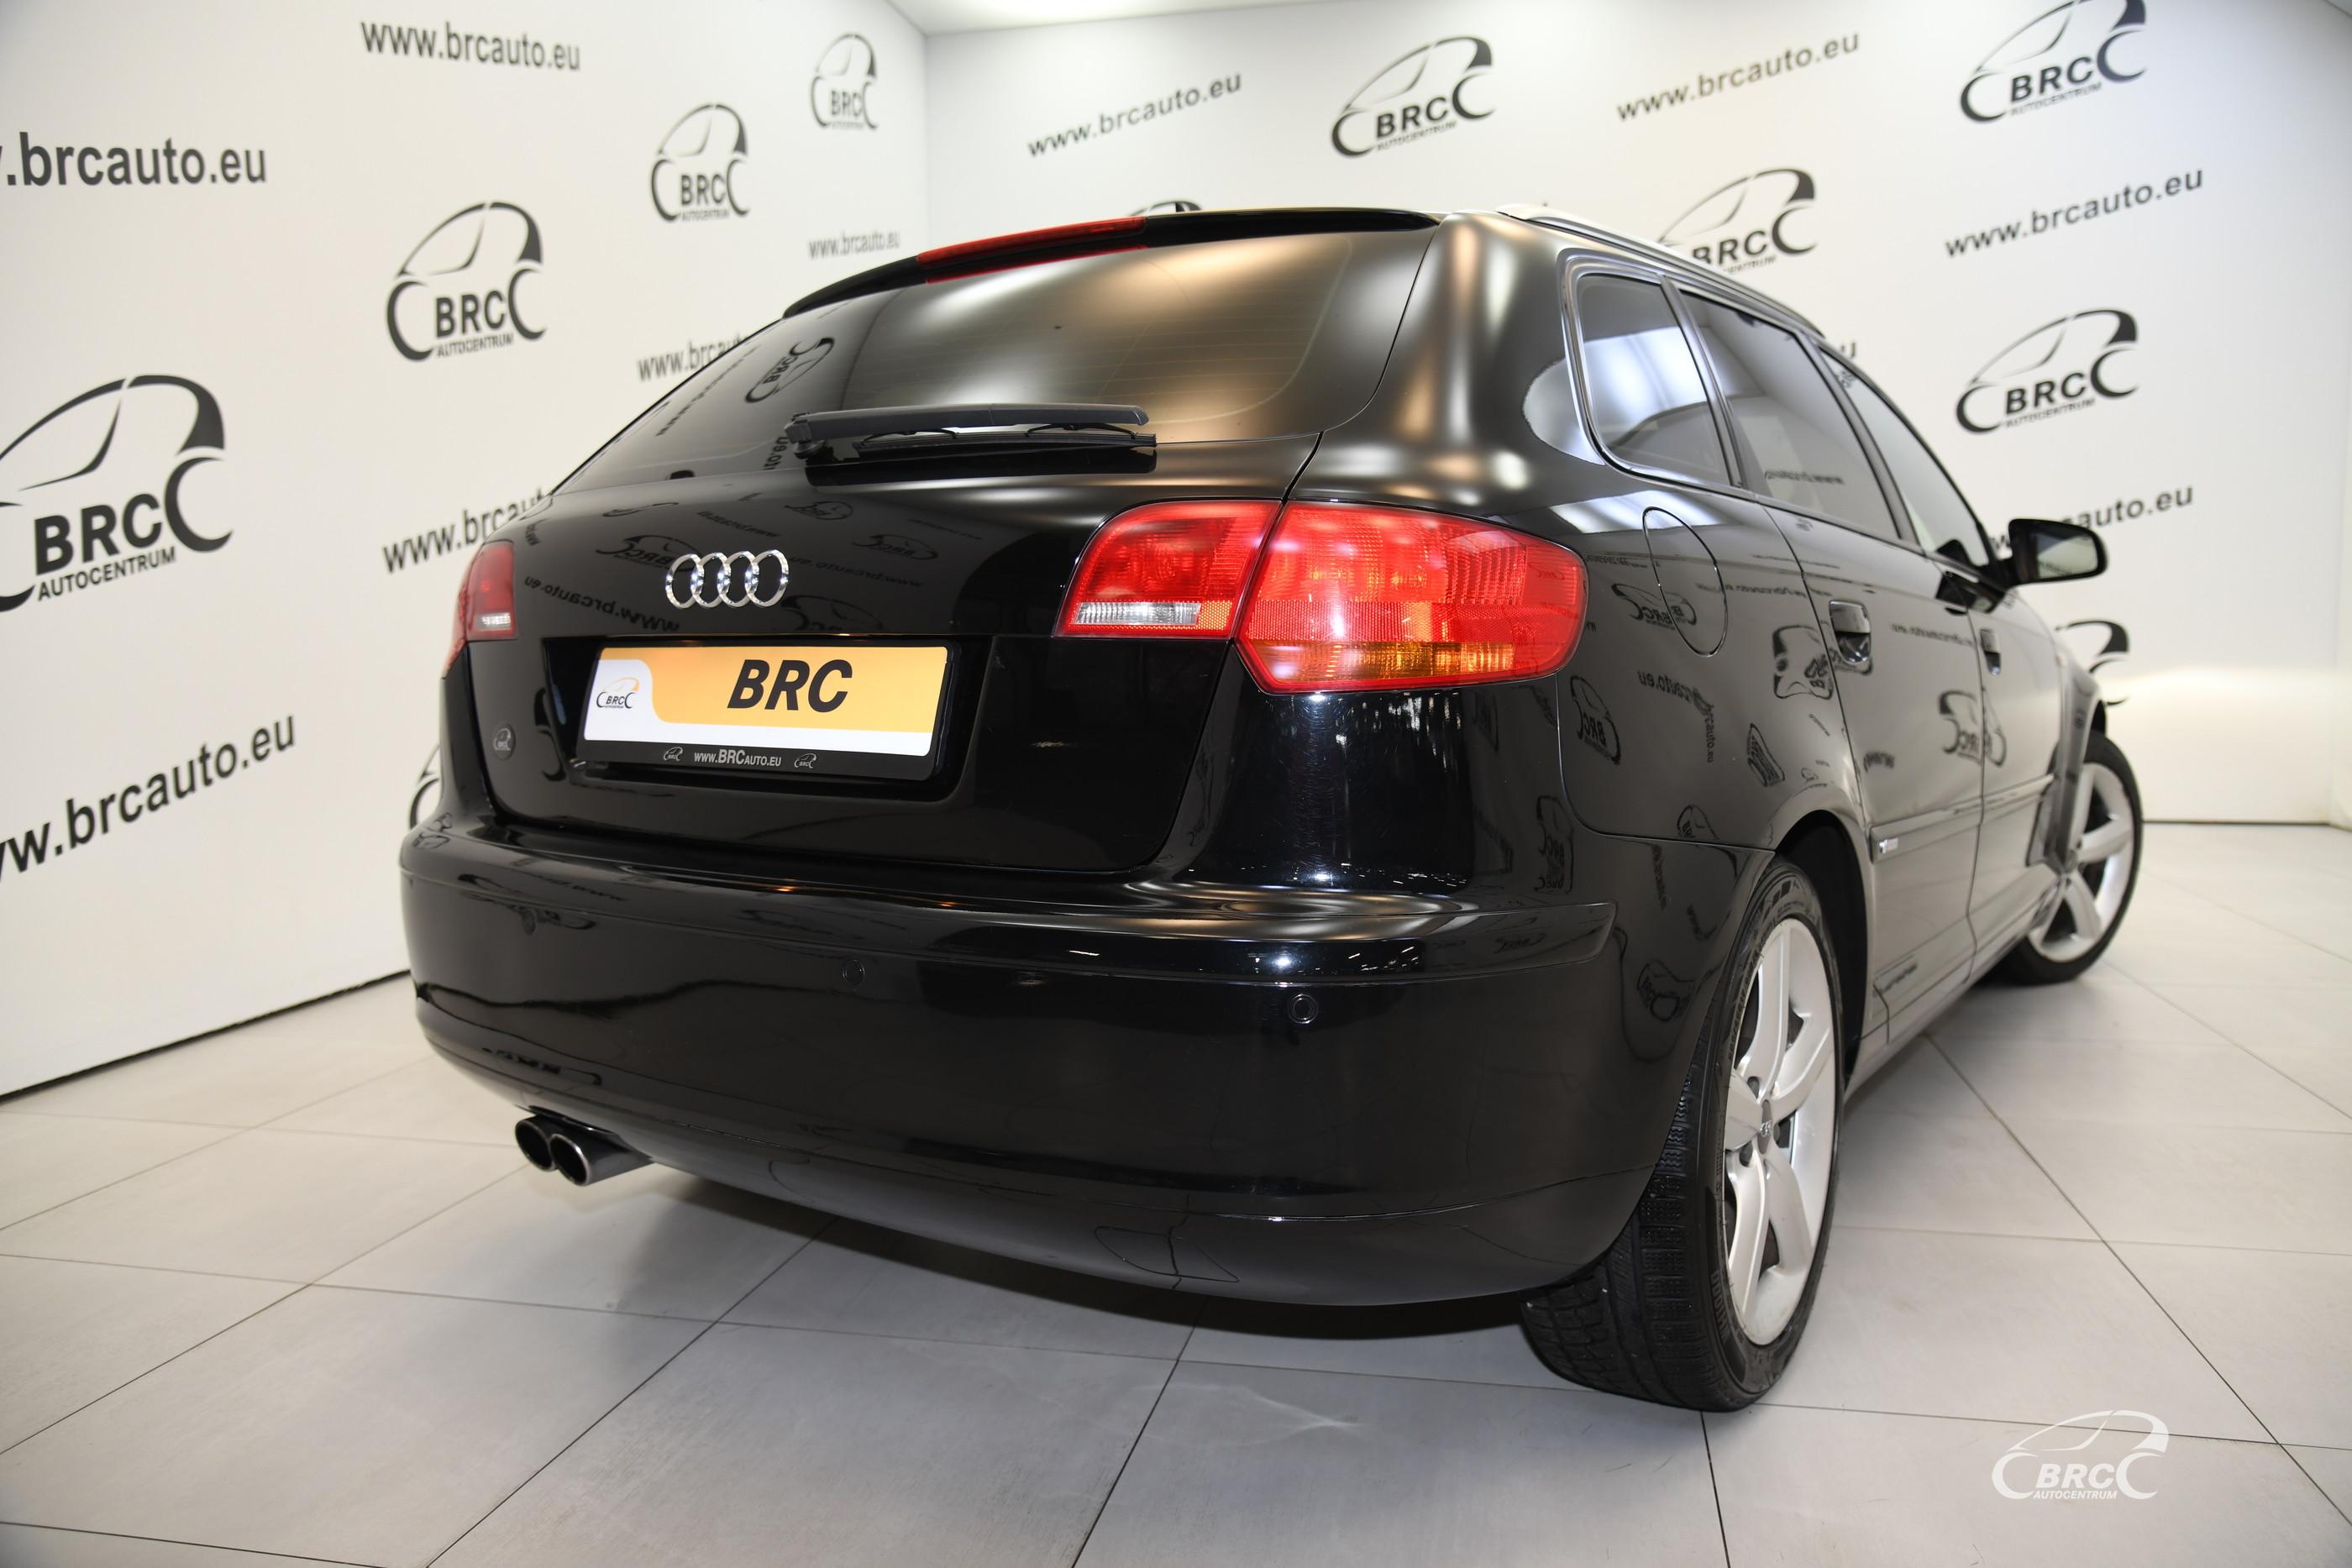 Audi A3 2.0 TDI S-Line Sportback Automatas